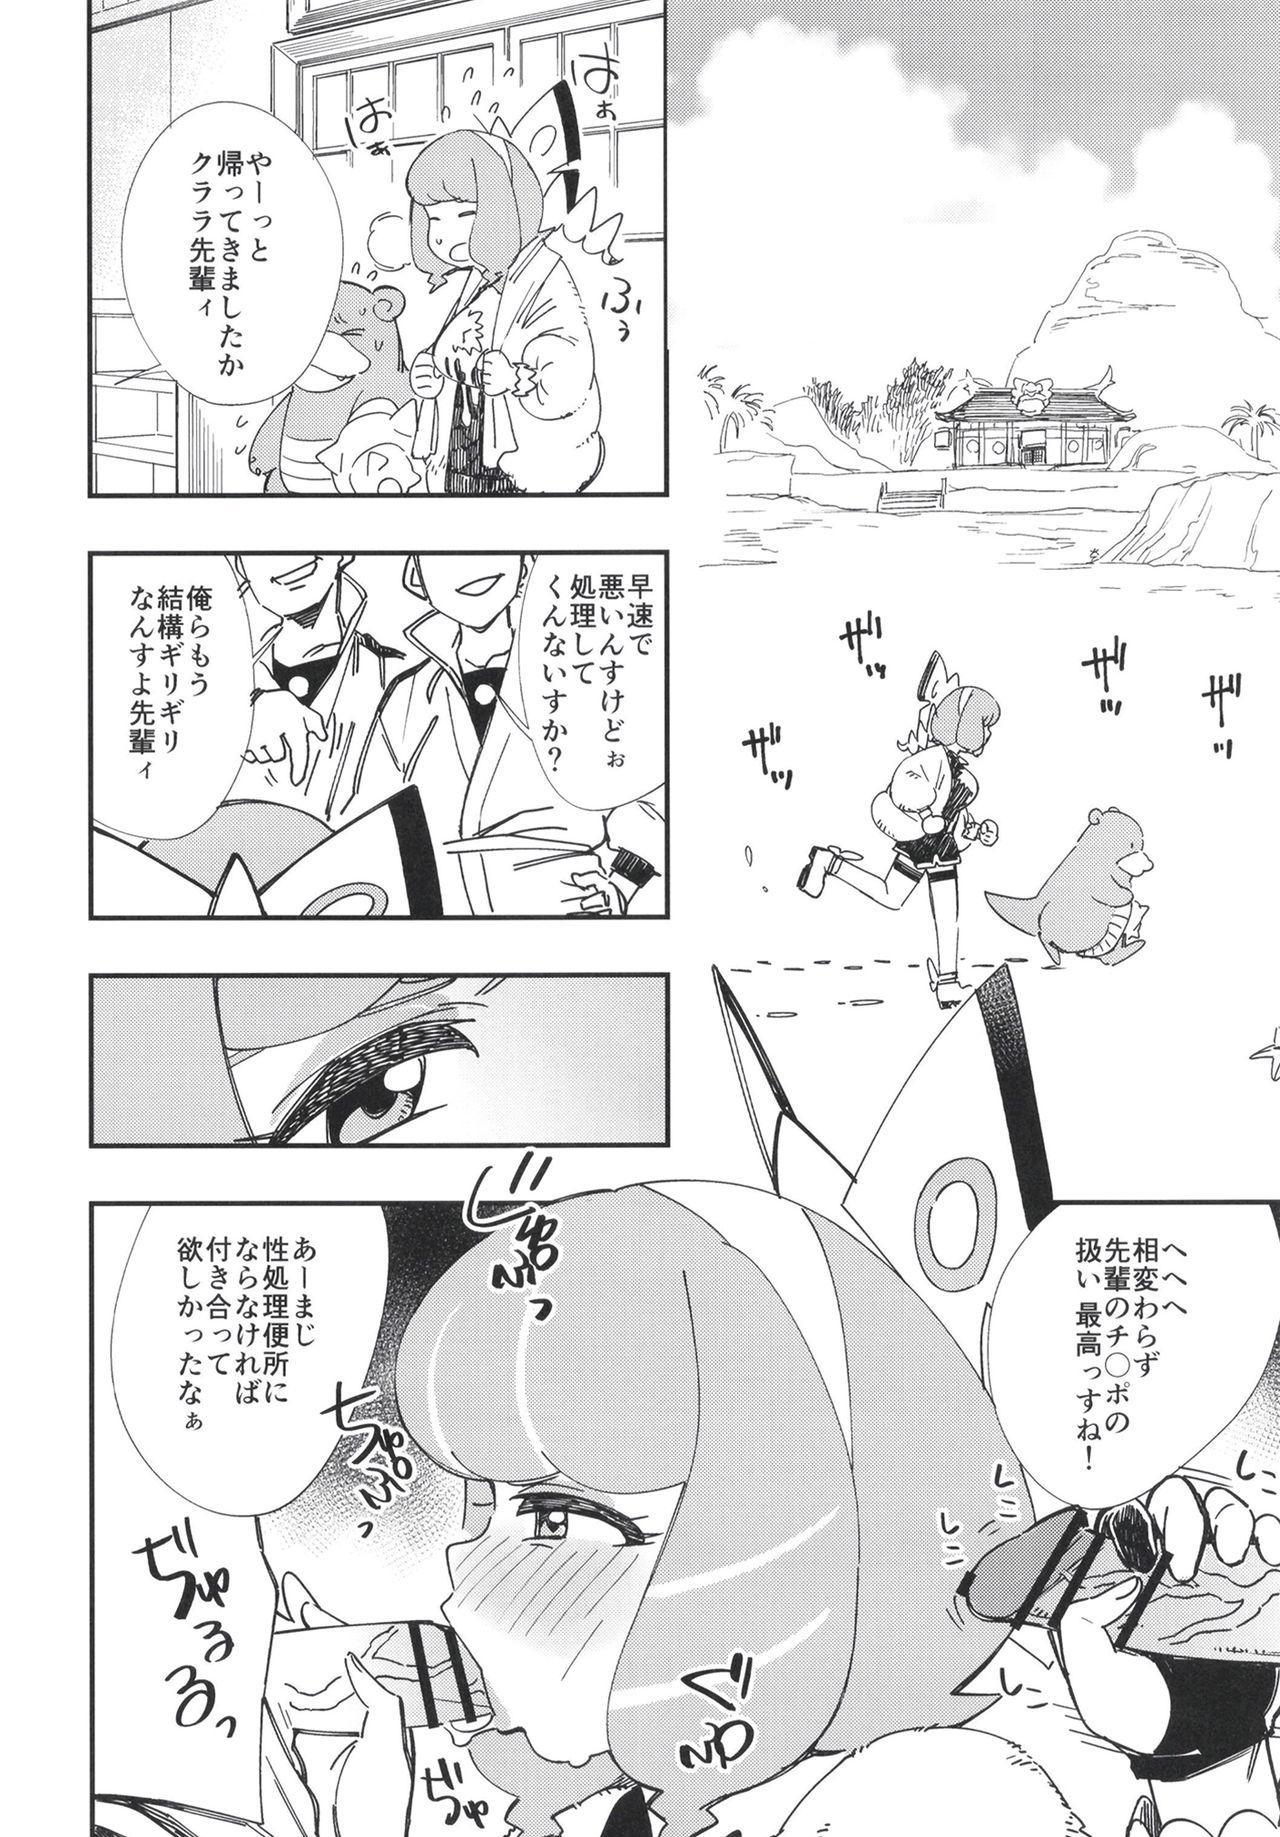 Kurakura Kyouka Gekkan 13